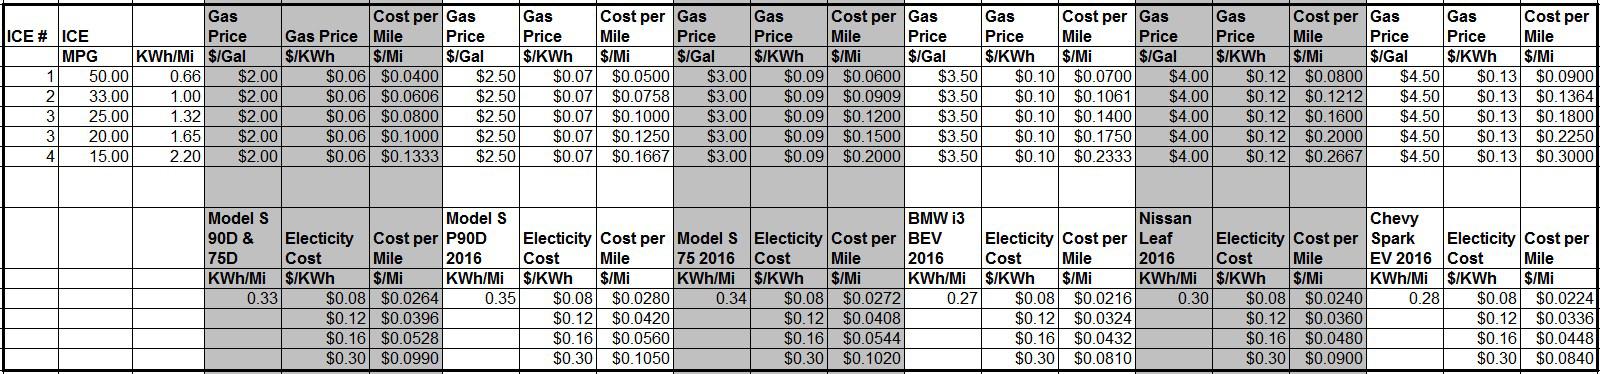 Energy_Cost_Comparison.jpg